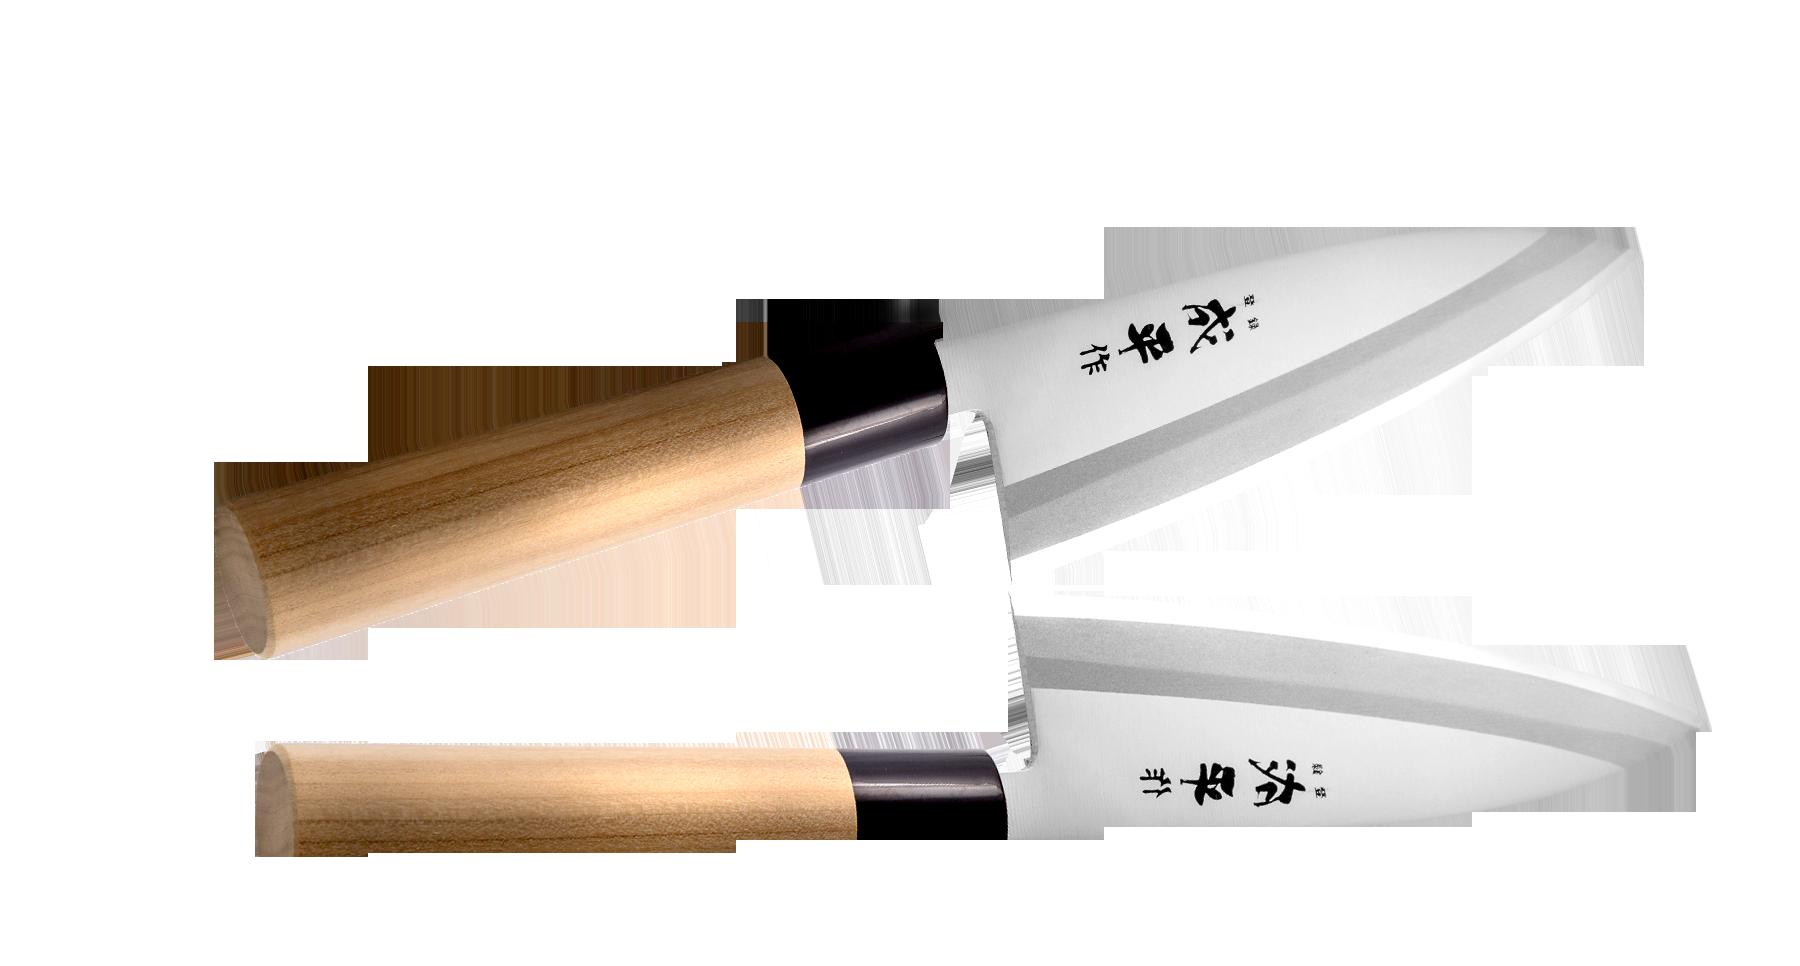 Нож Деба Narihira 150 мм, сталь AUS-8, рукоять деревоTojiro<br>Нож Деба Narihira 150 мм, сталь AUS-8, рукоять дерево<br>